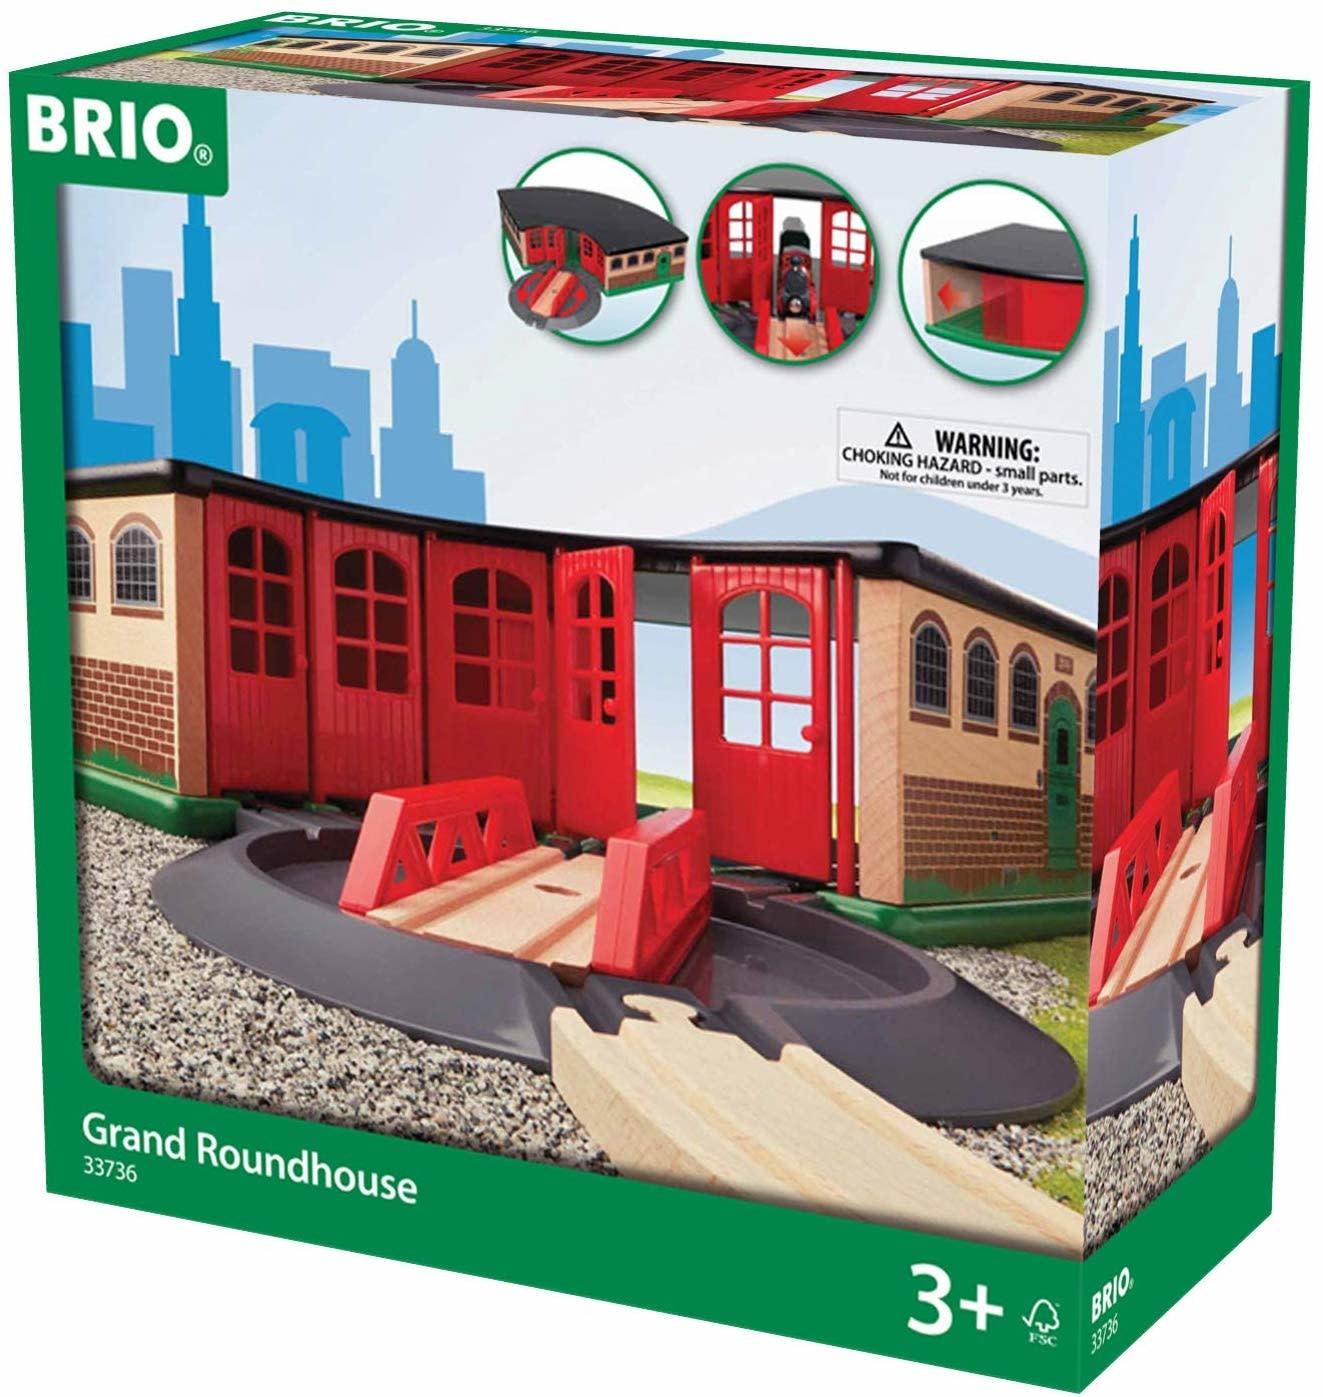 BRIO Grand Roundhouse